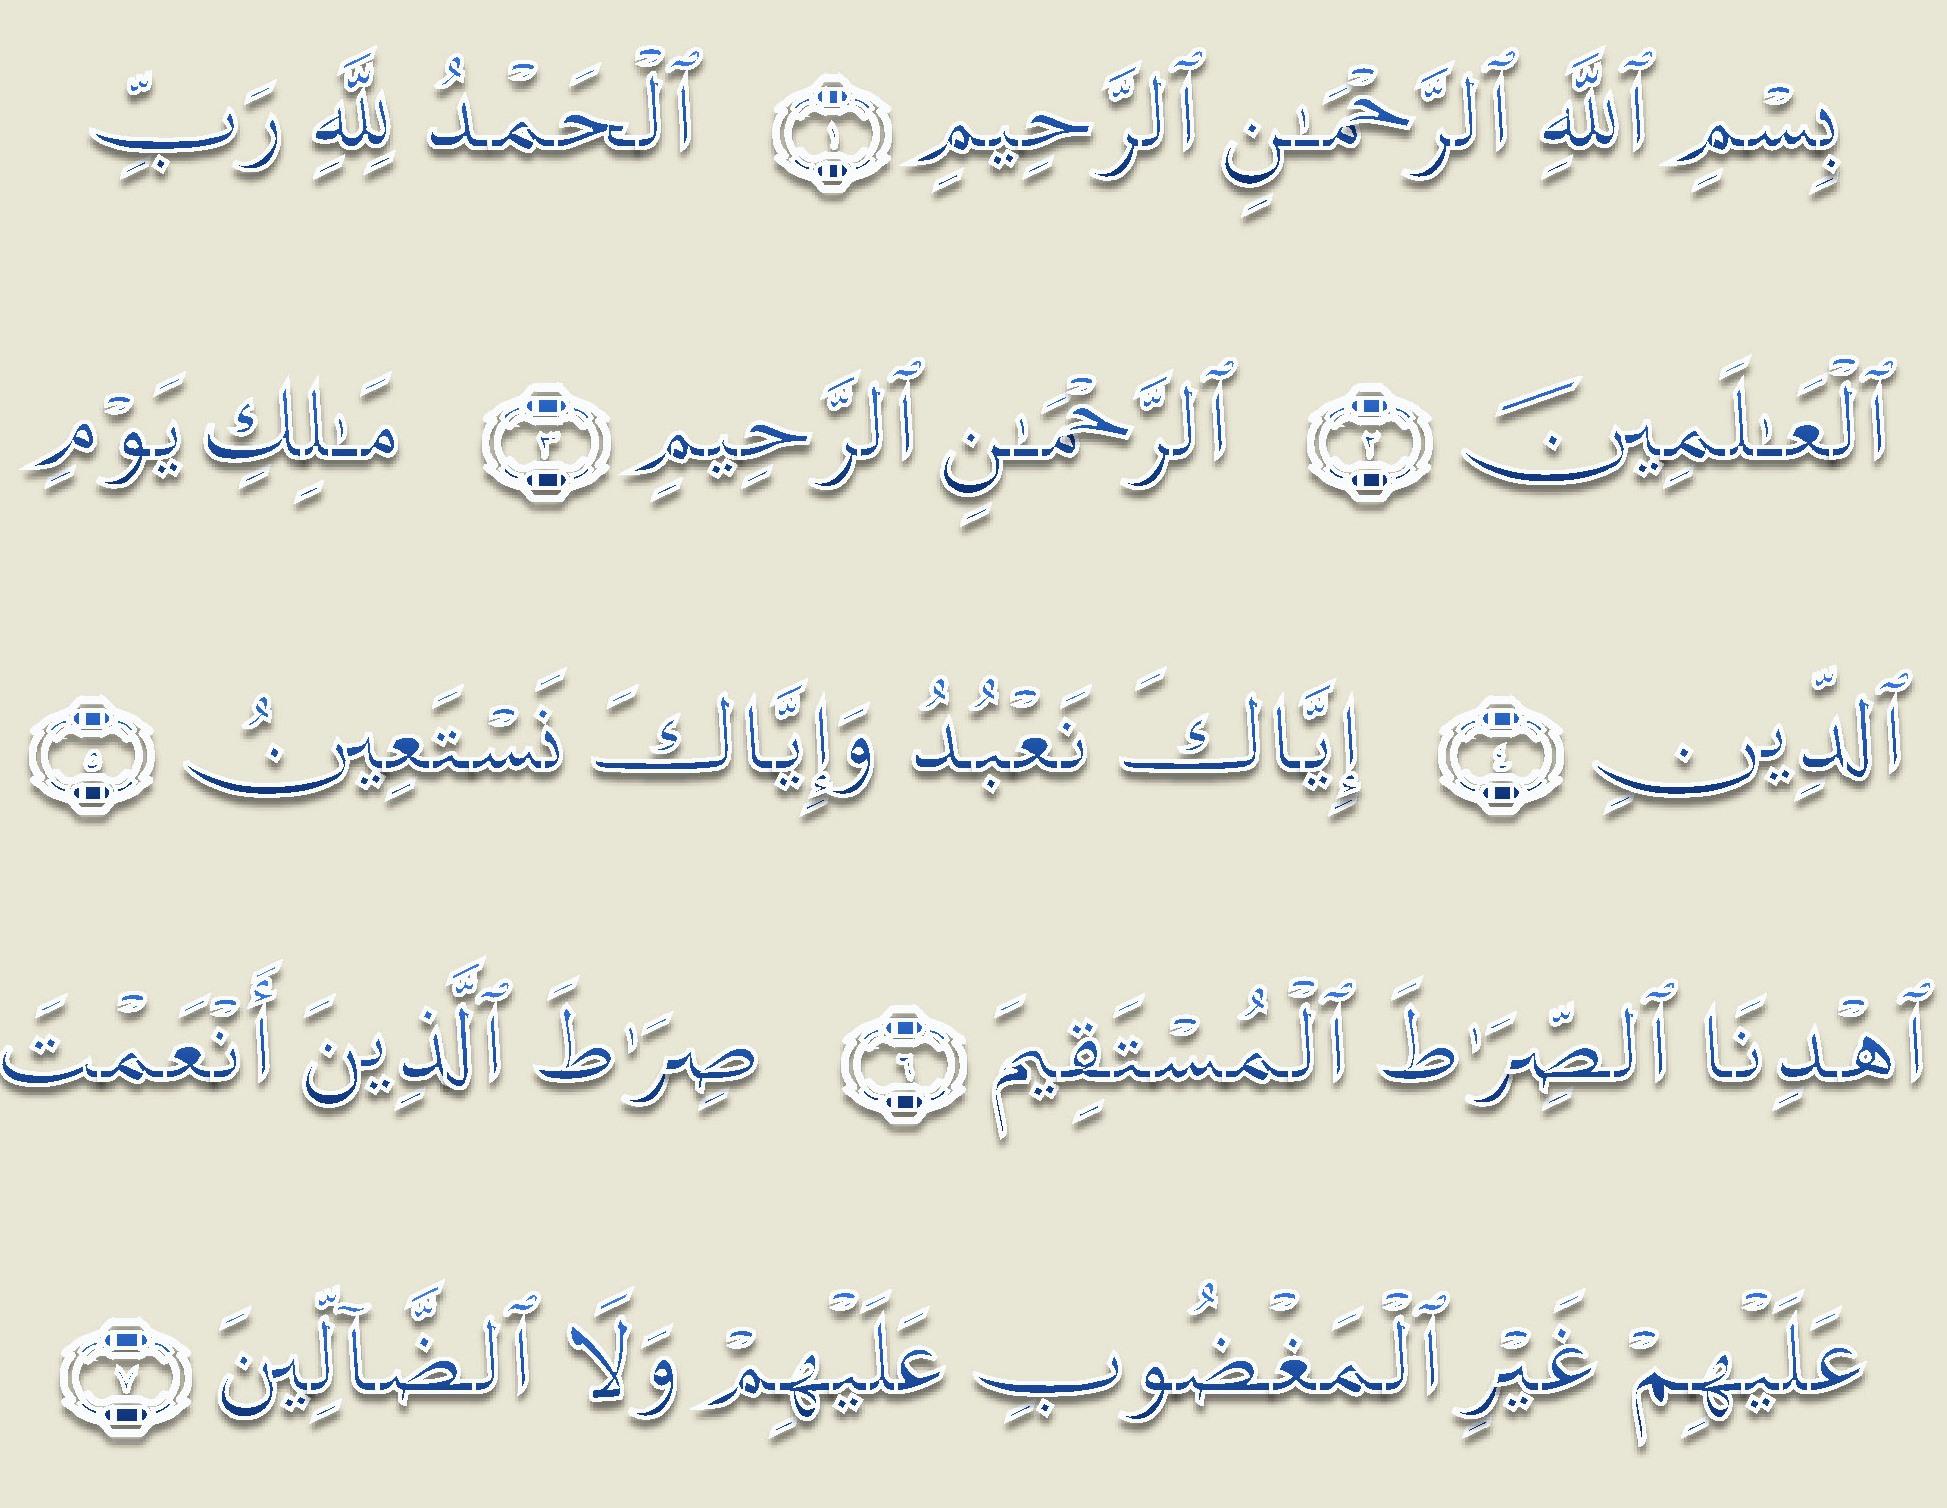 Al Quran Surat Al Fatihah Dan Terjemah Alquranmasbadarcom